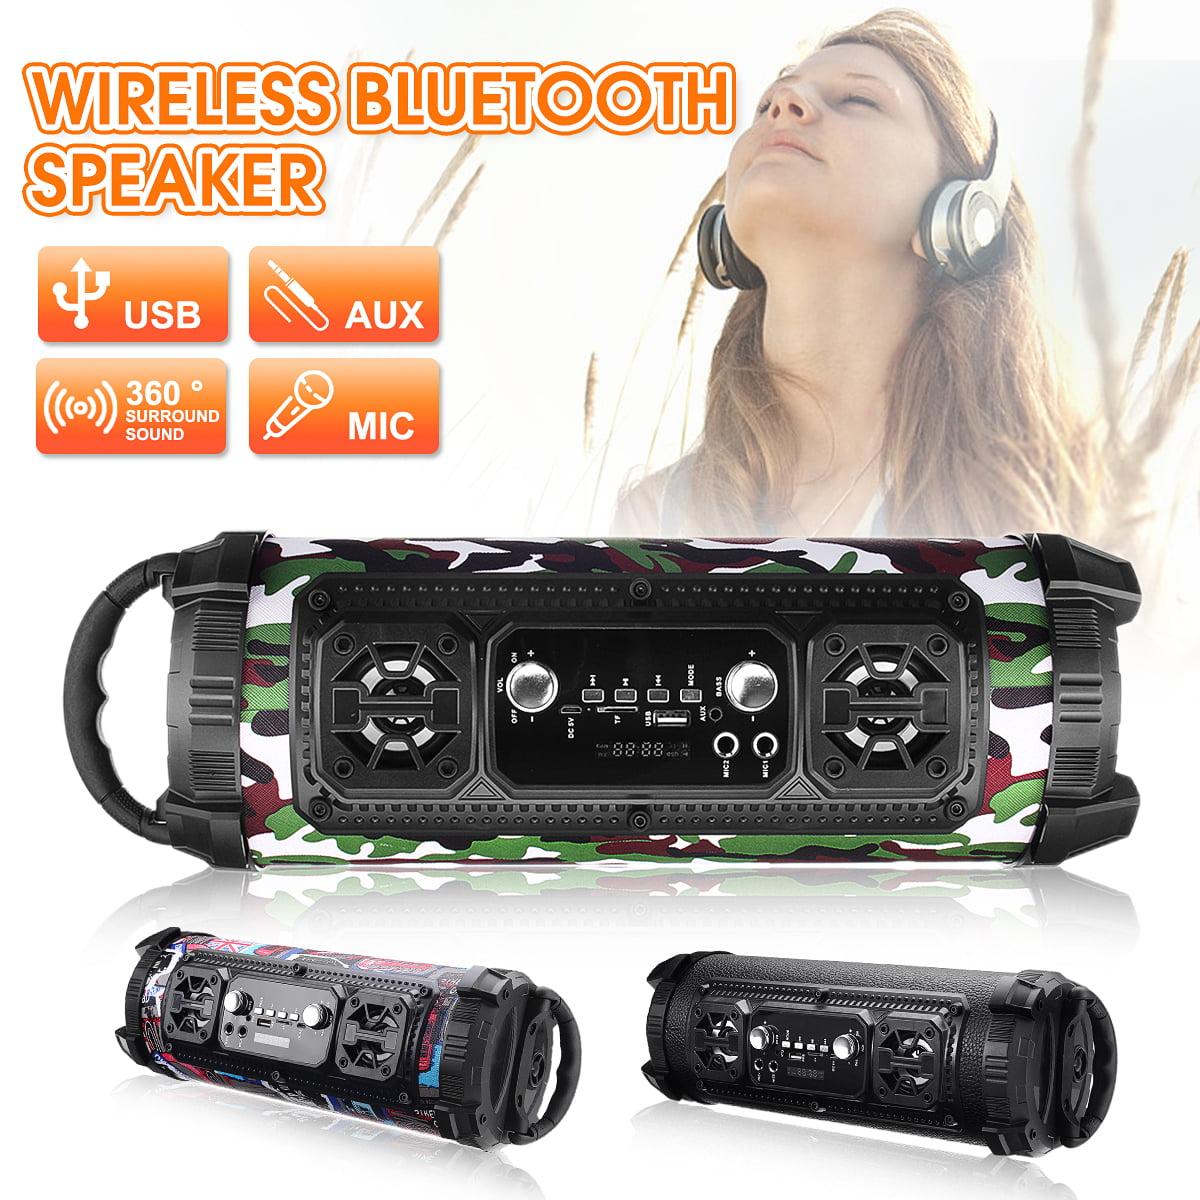 Portable Bluetooth Speaker Wireless Stereo Loud Super Bass Sound TF LED Light